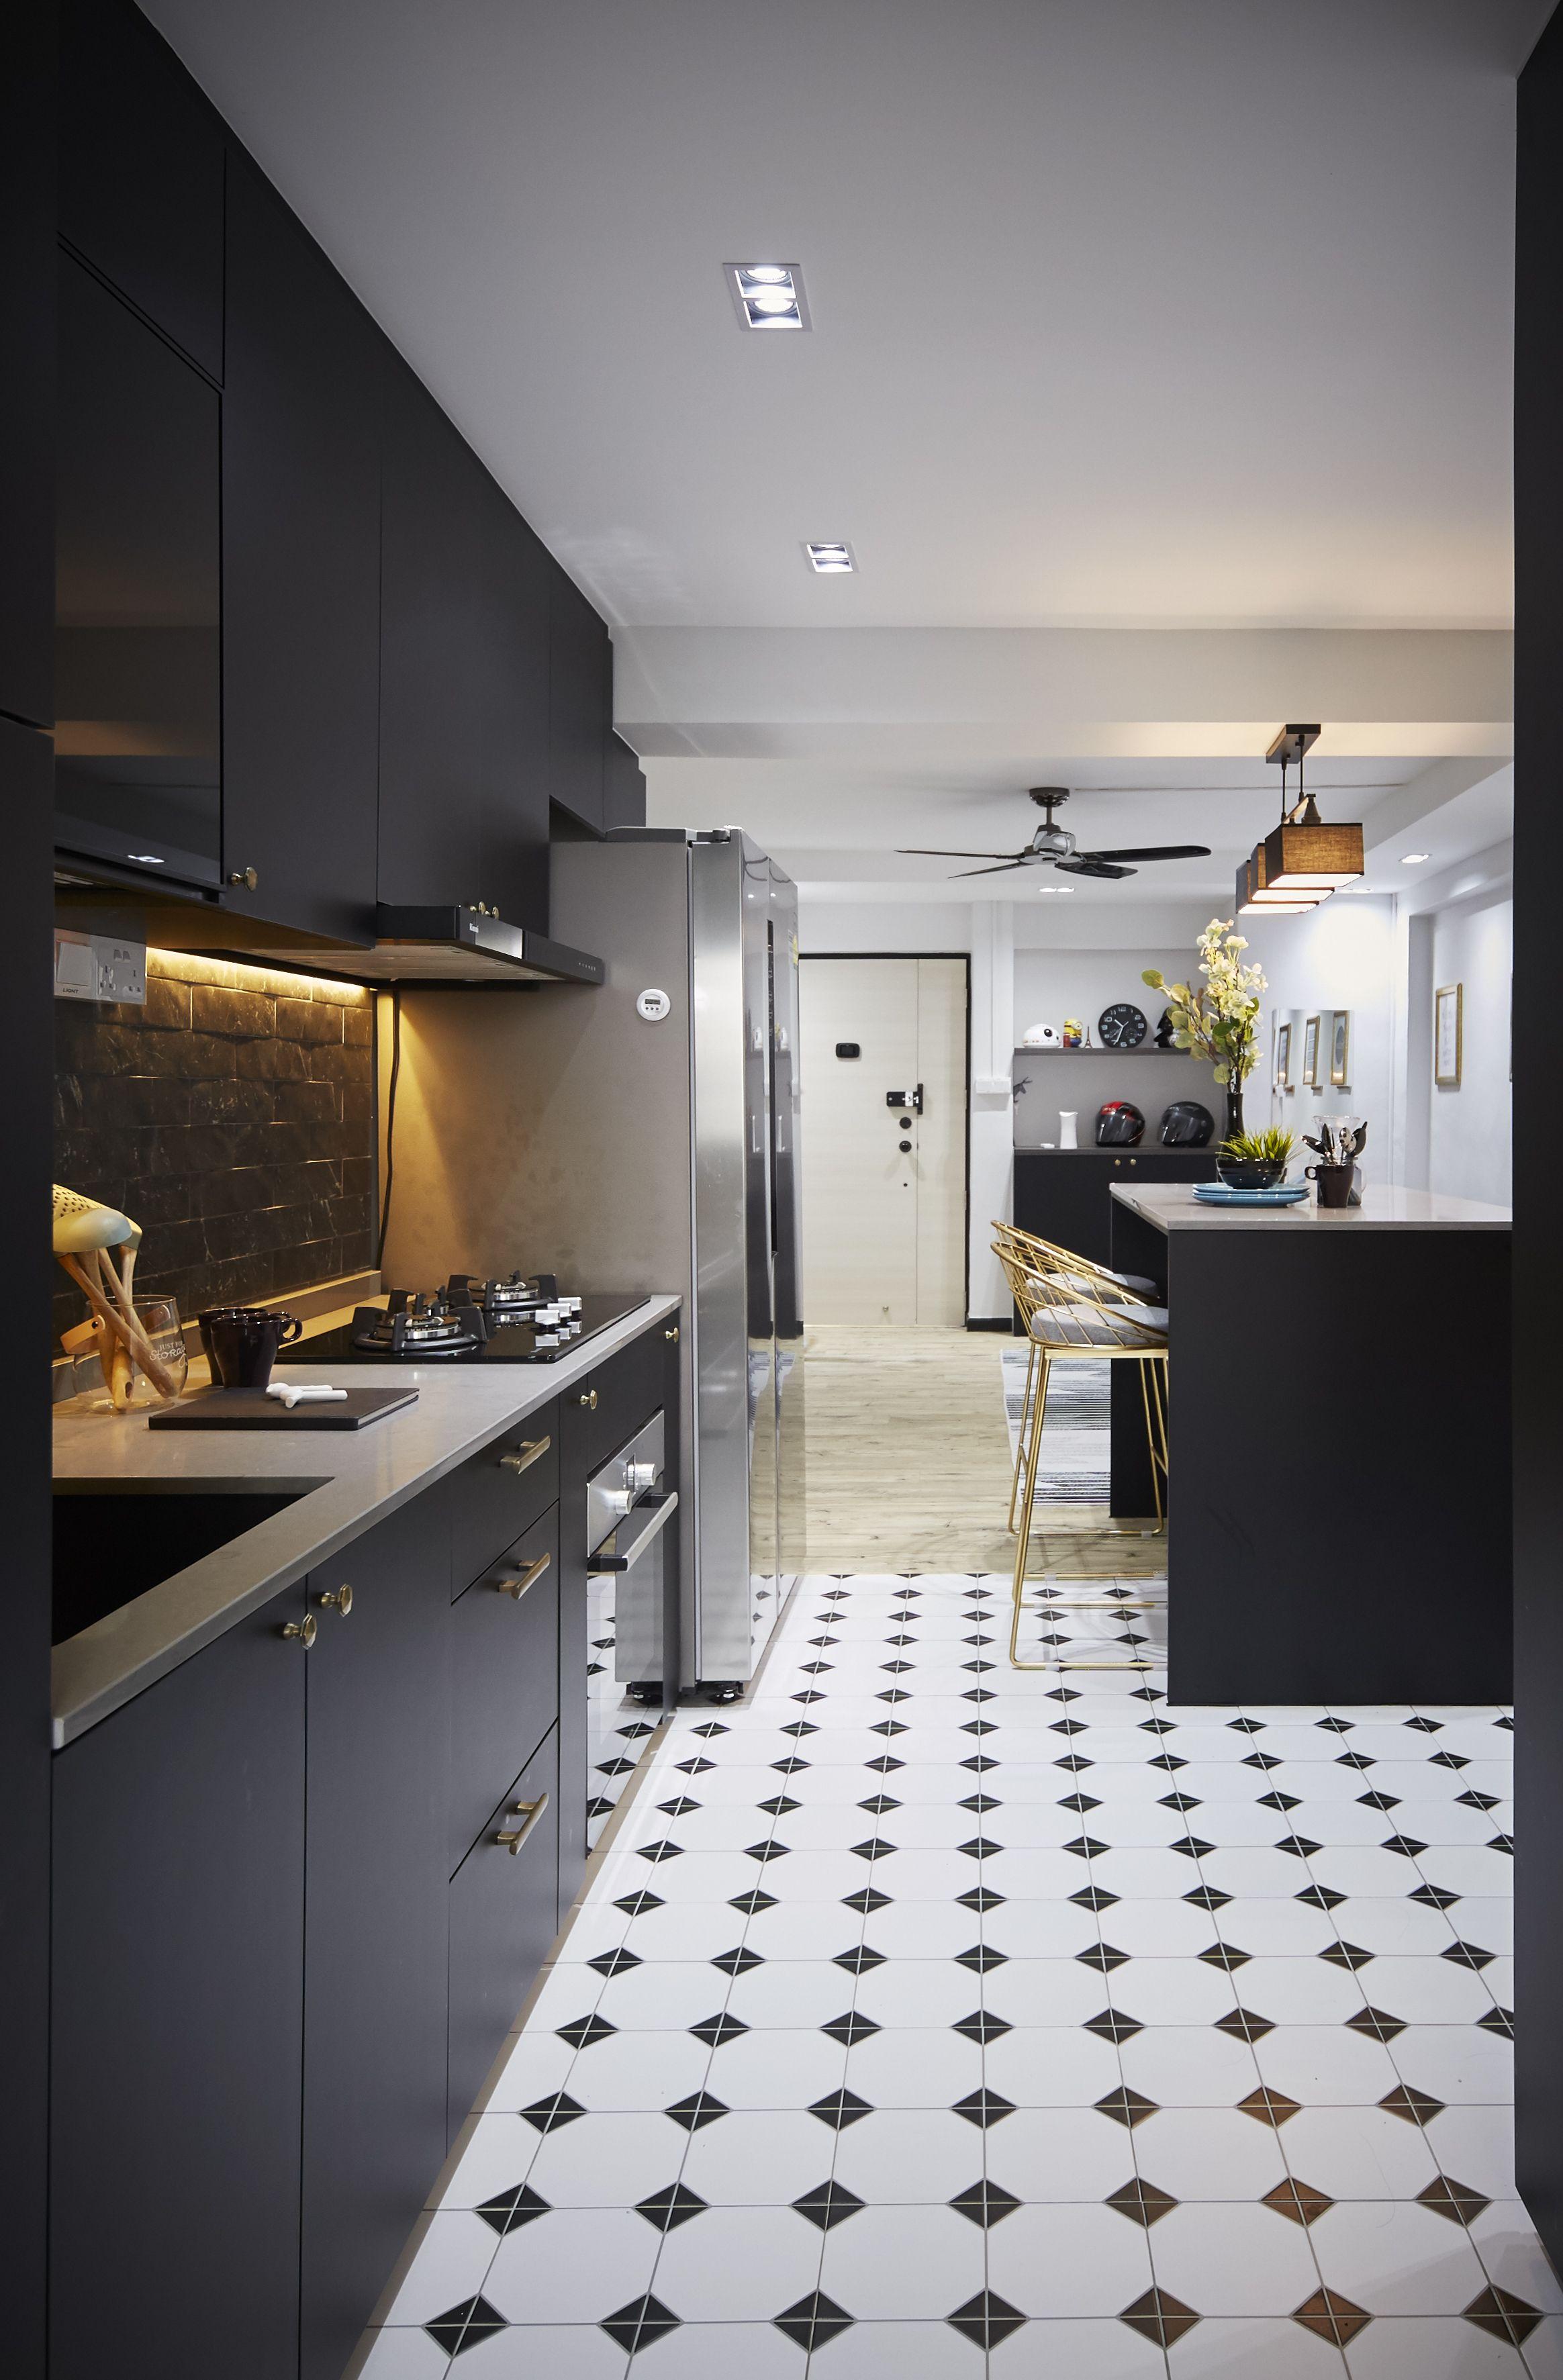 Virtual Kitchen Design Hdb Singapore: Carpenters Interior Design HDB Resale Apartment Design